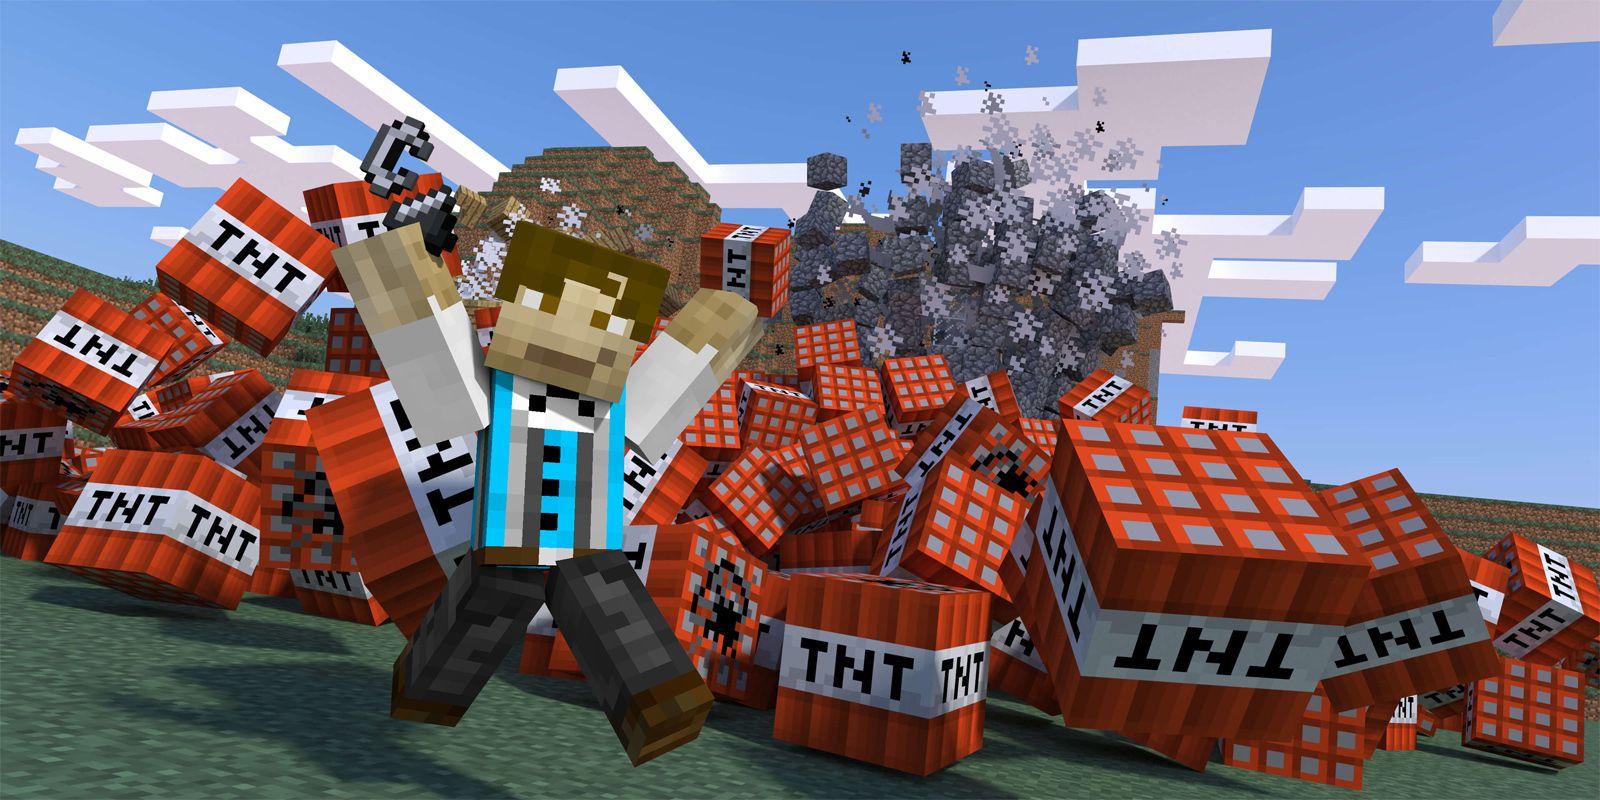 Minecraft Modder Creates TNT That Can Mine Tunnels Automatically